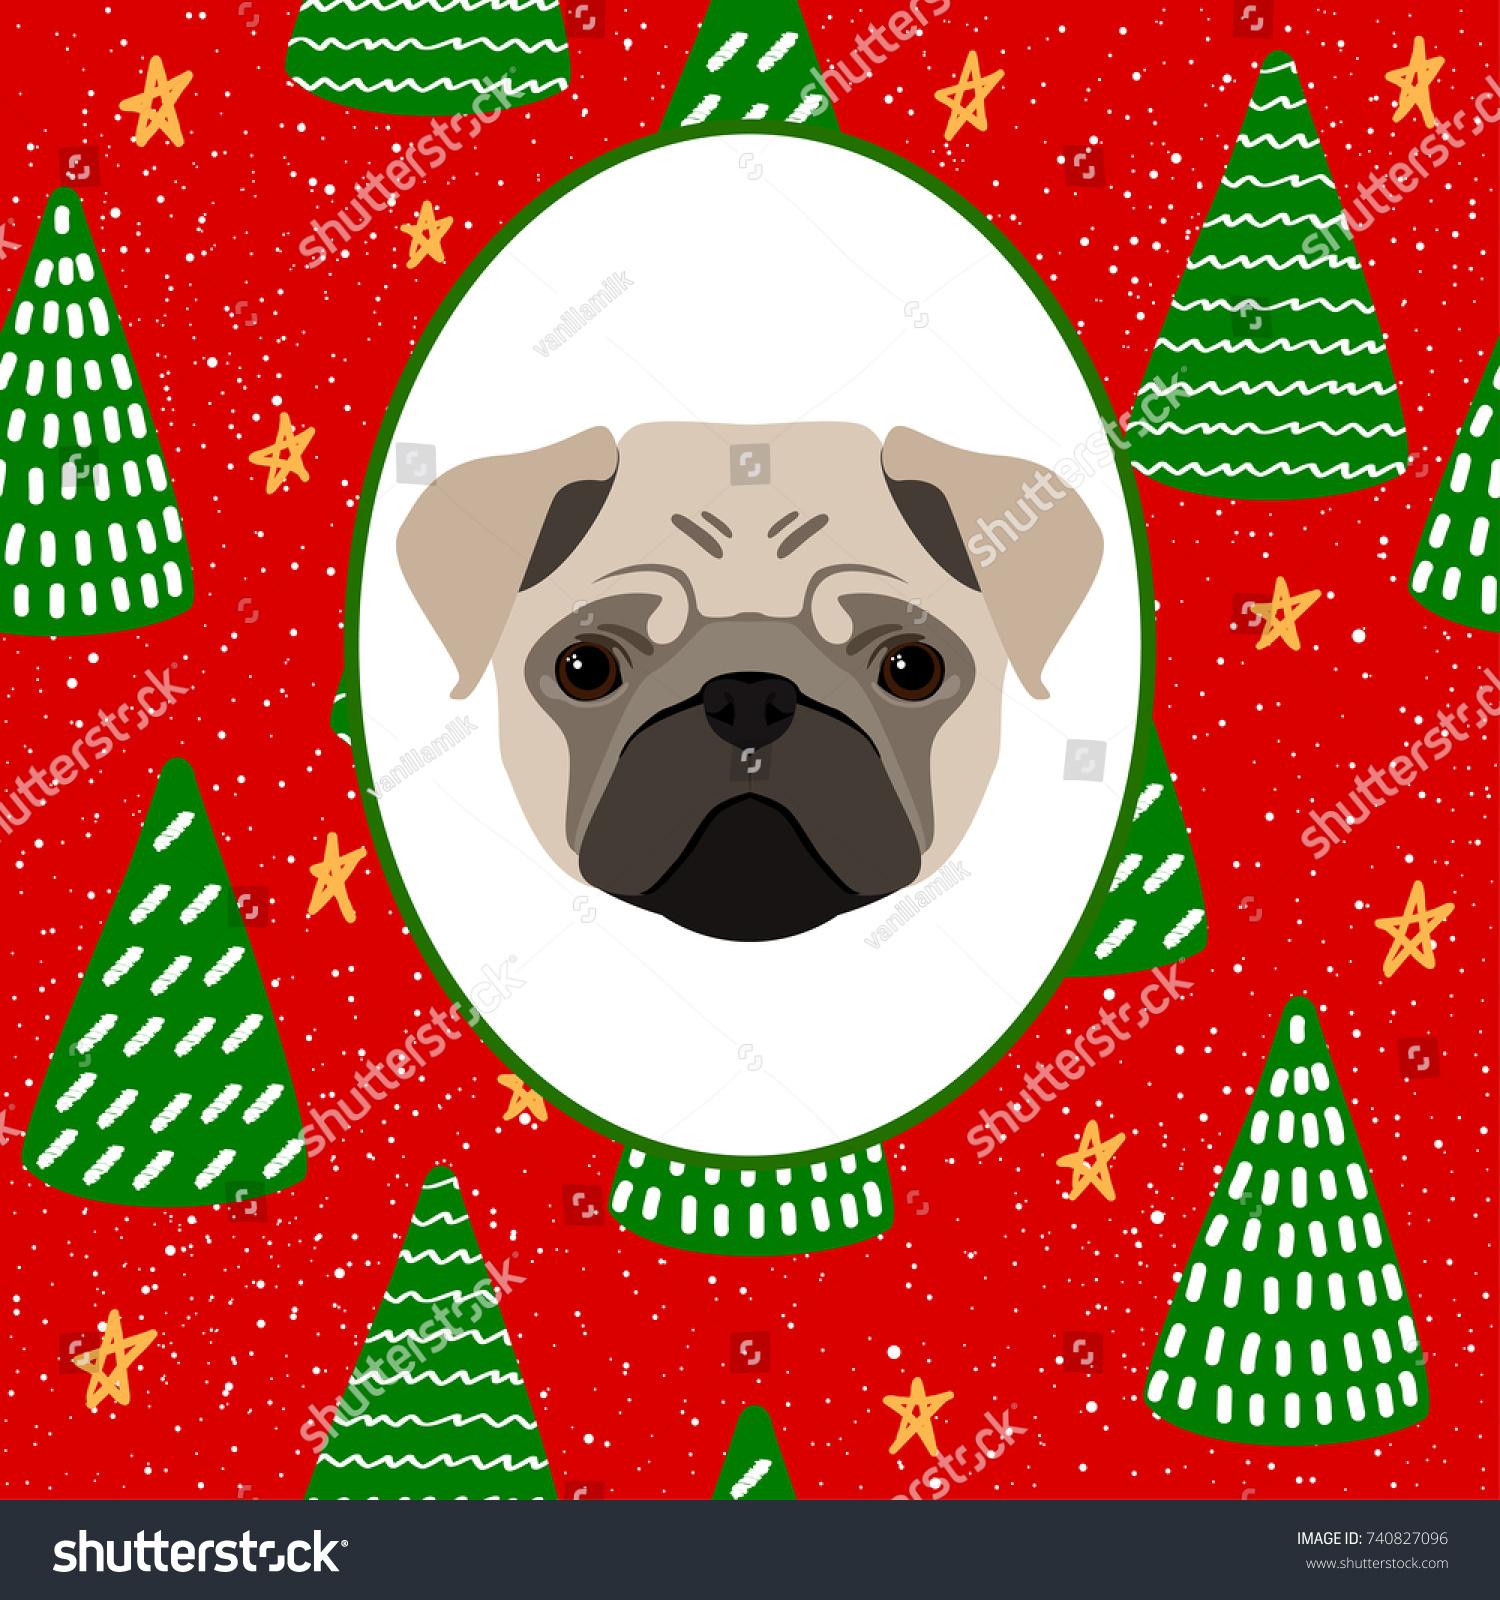 New Year Dog Card Template Cute Stock Vector 740827096 - Shutterstock